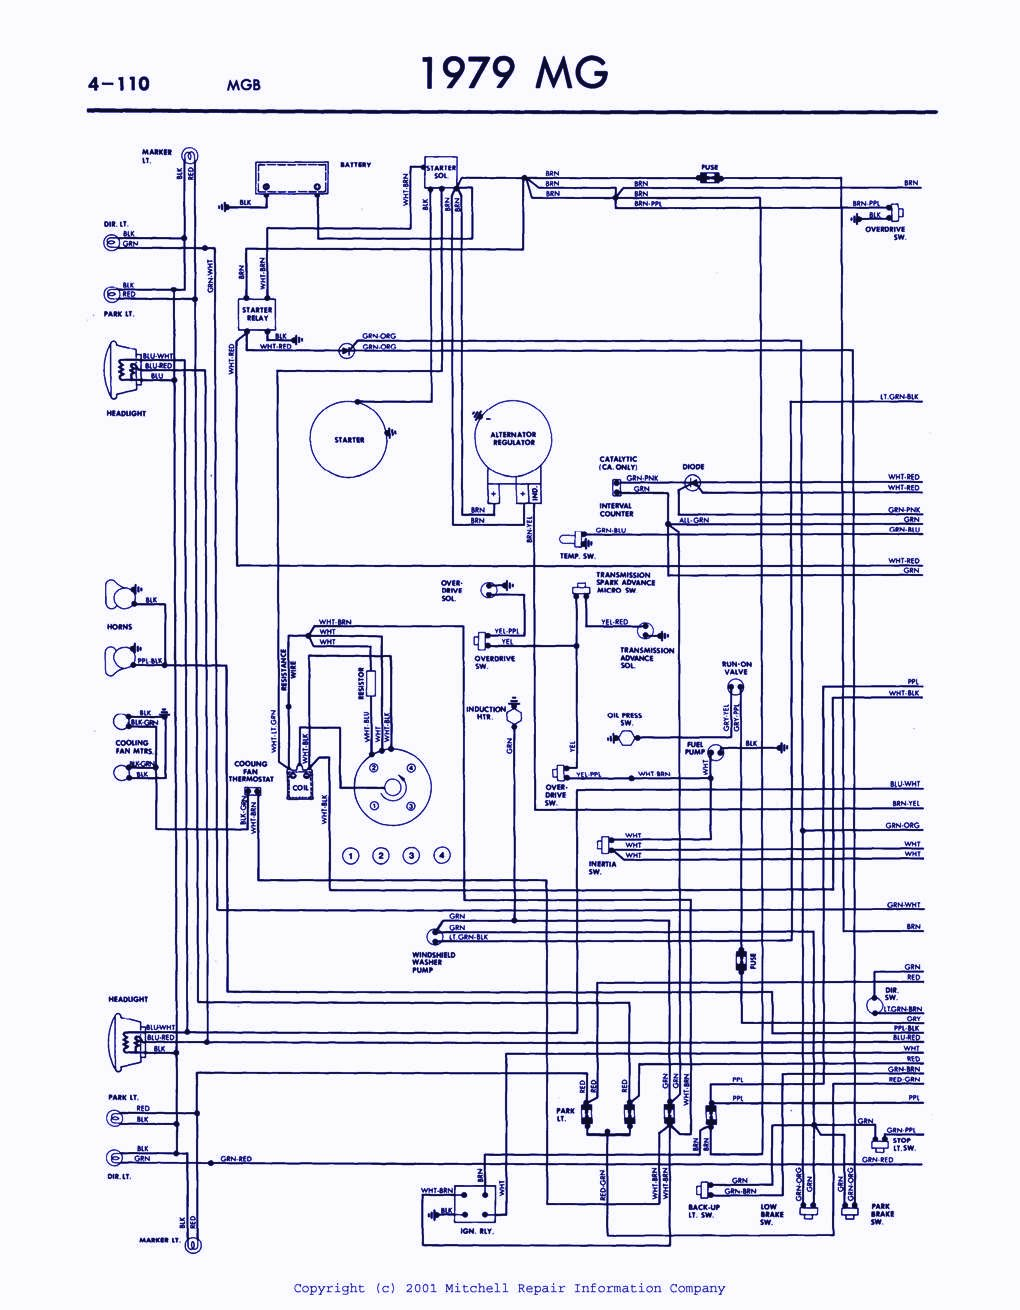 1972 mg midget ignition wiring diagram wiring diagram pictures 1975 mg midget wiring 1978 mgb wiring [ 1020 x 1310 Pixel ]